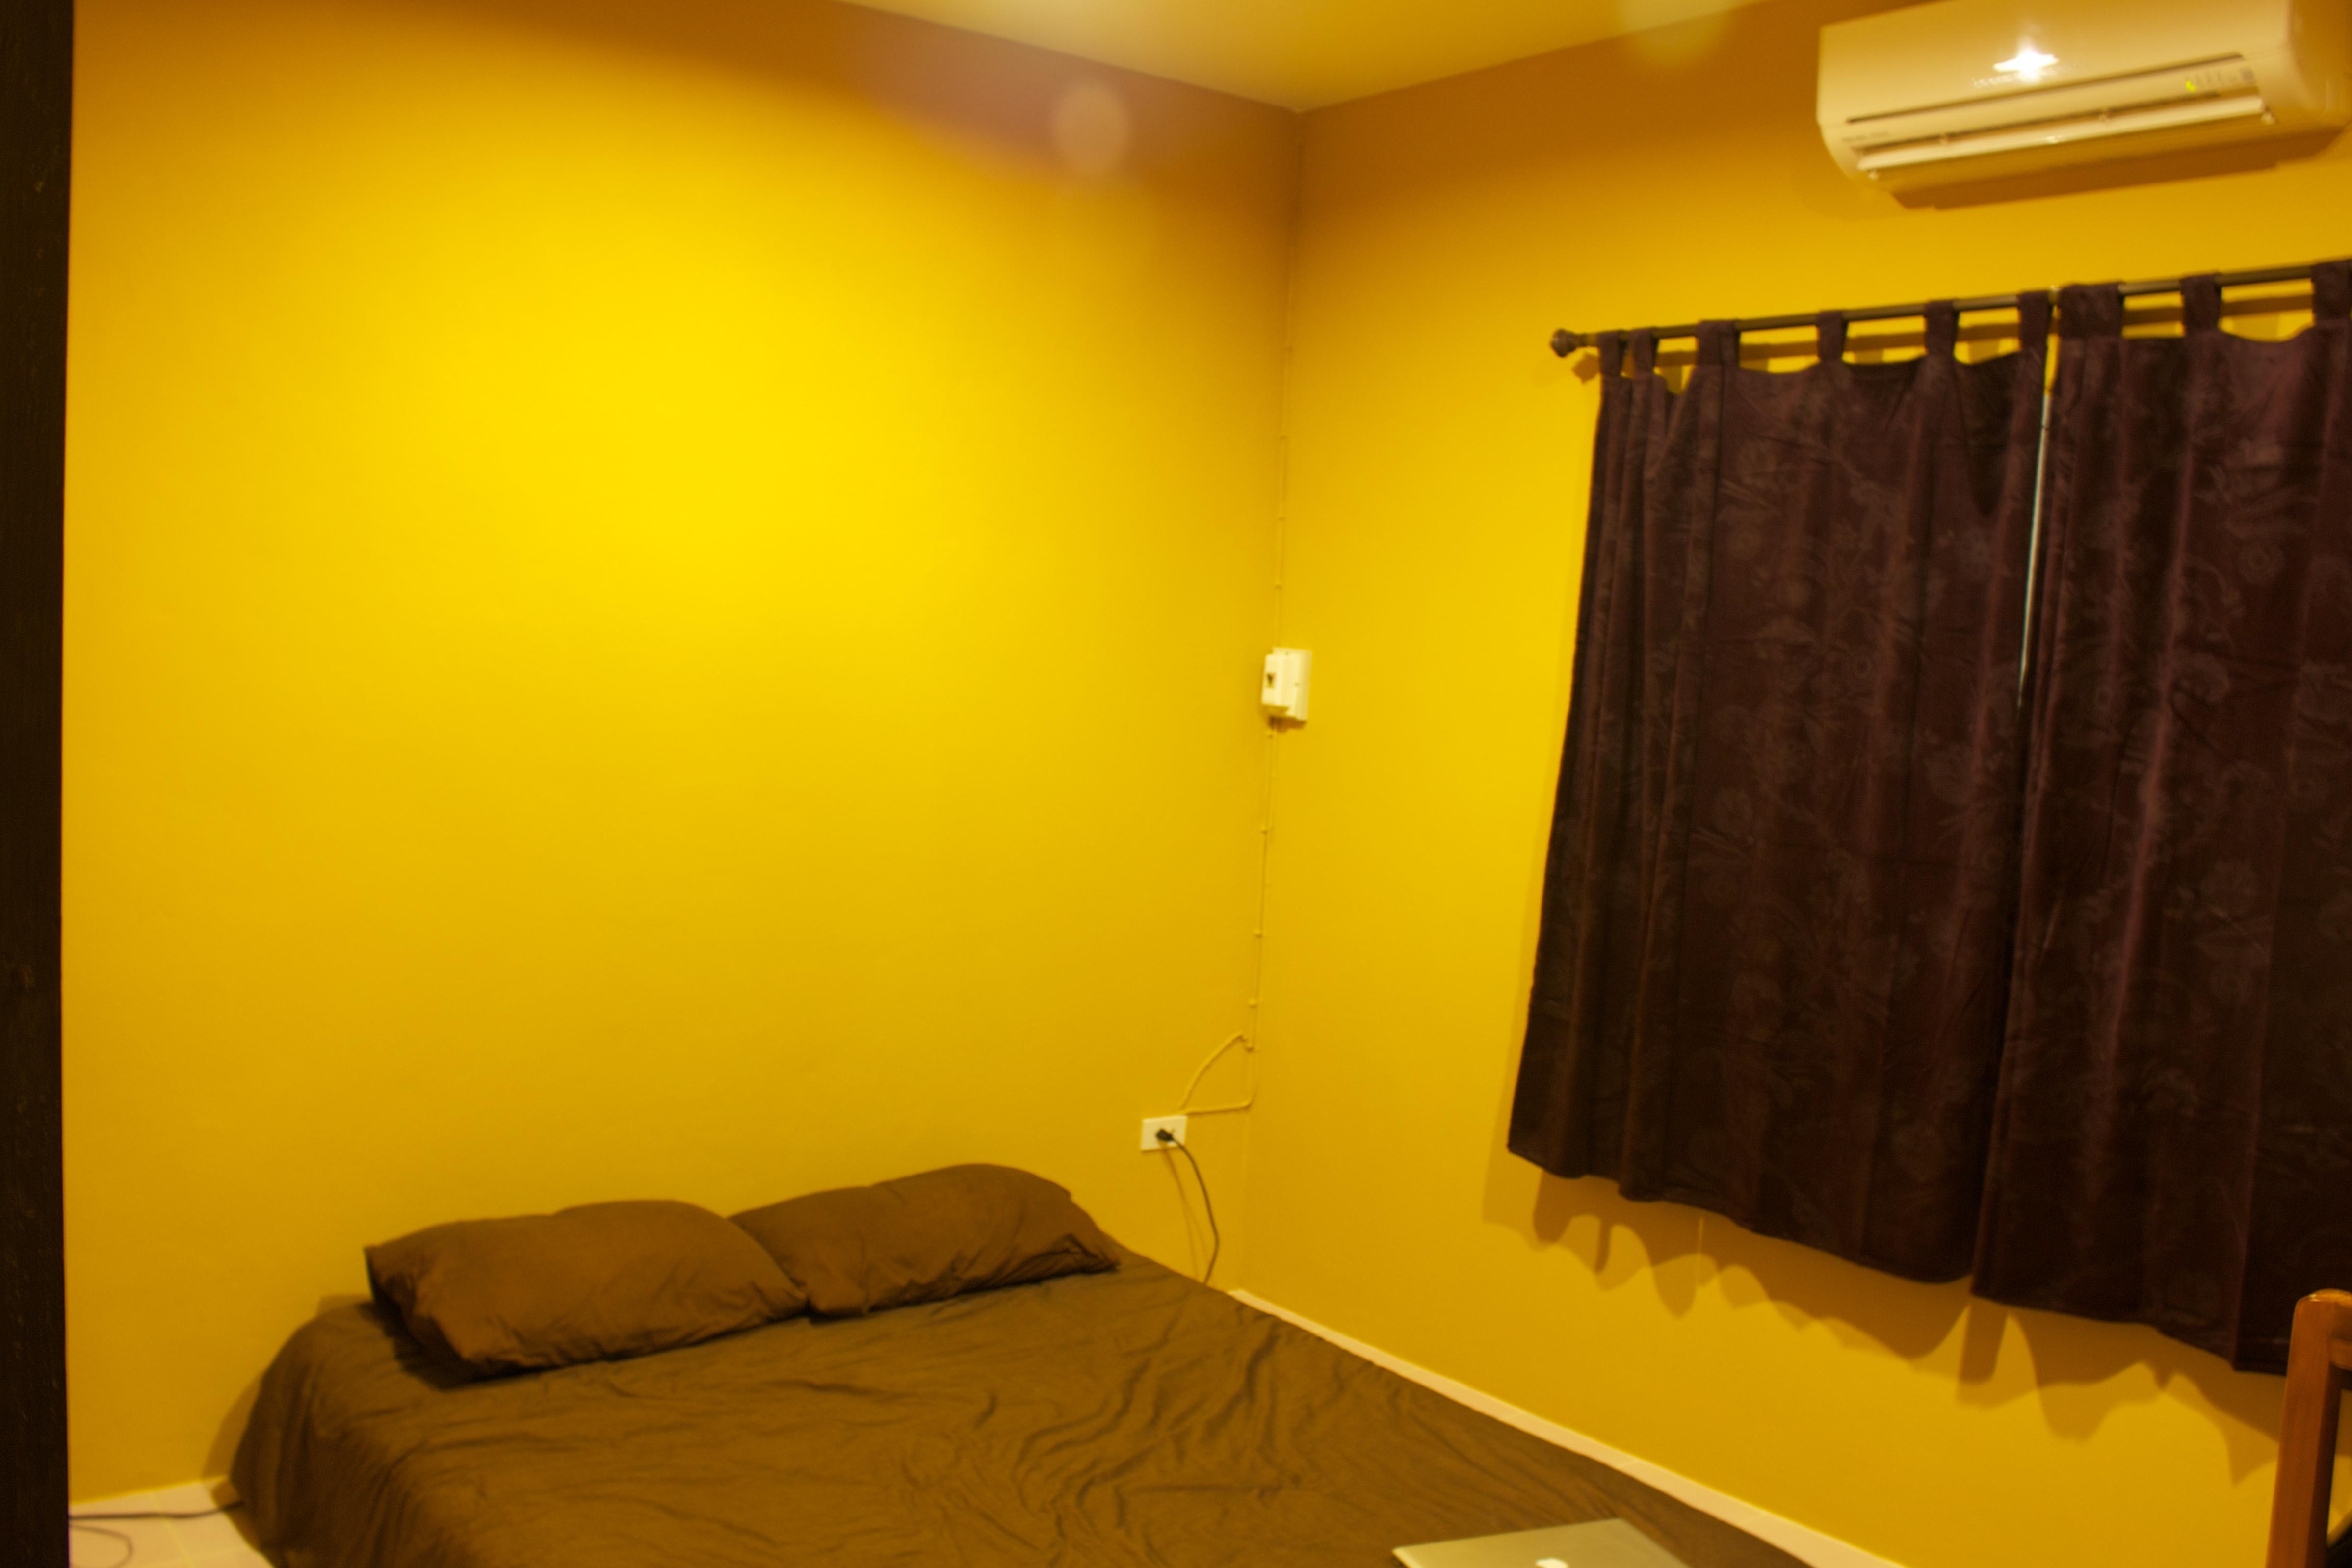 2012-03-25-yellow-jpeg-002.jpg